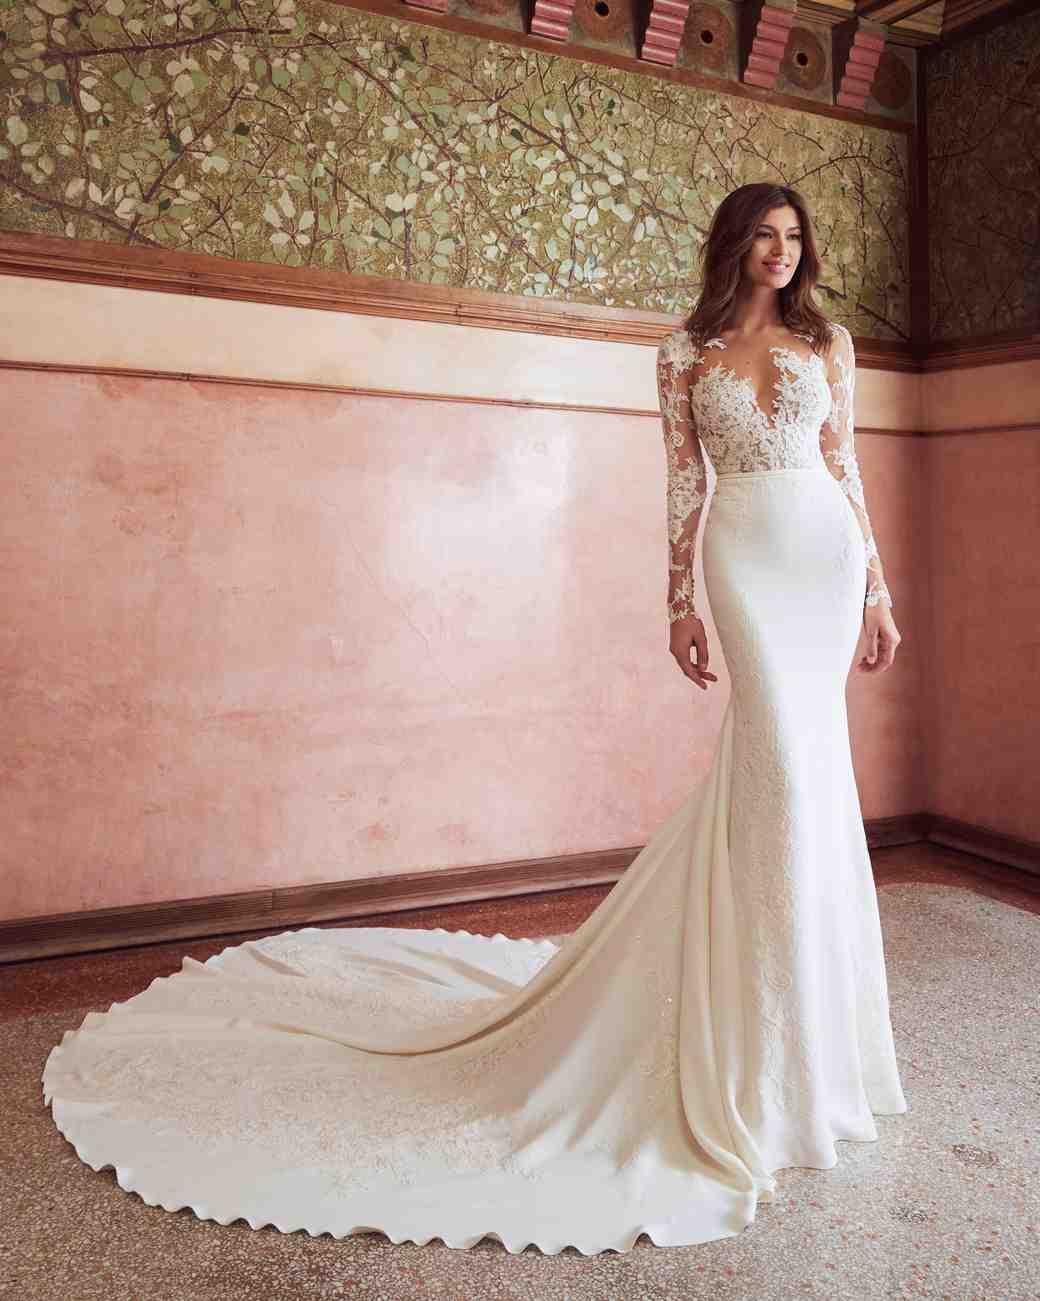 Wedding Dresses On Sale at Kleinfeld's